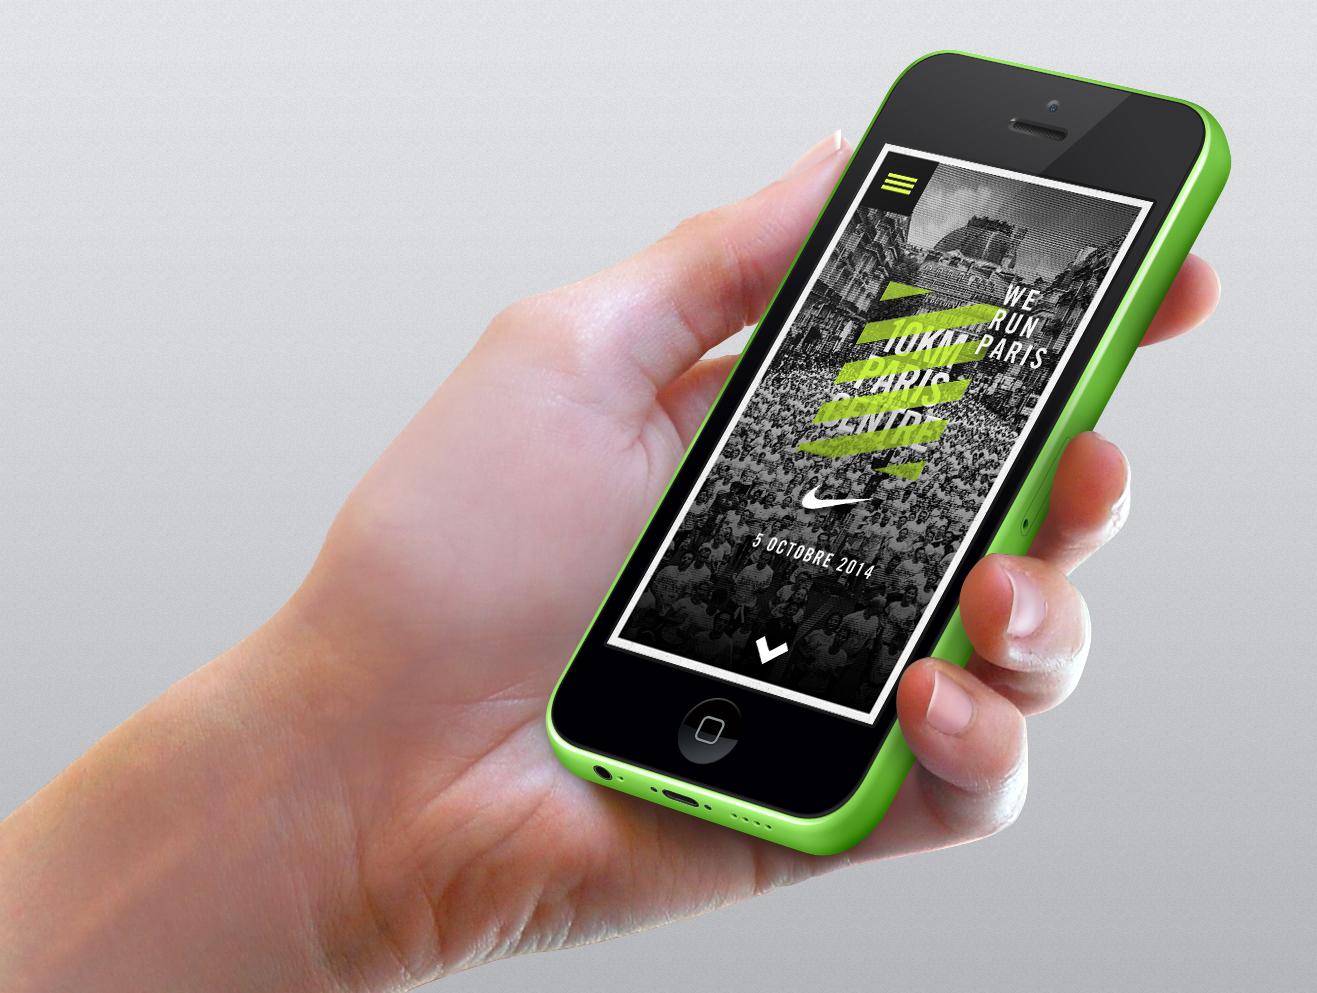 iPhone-mockup-hand-by-GWENO-v2